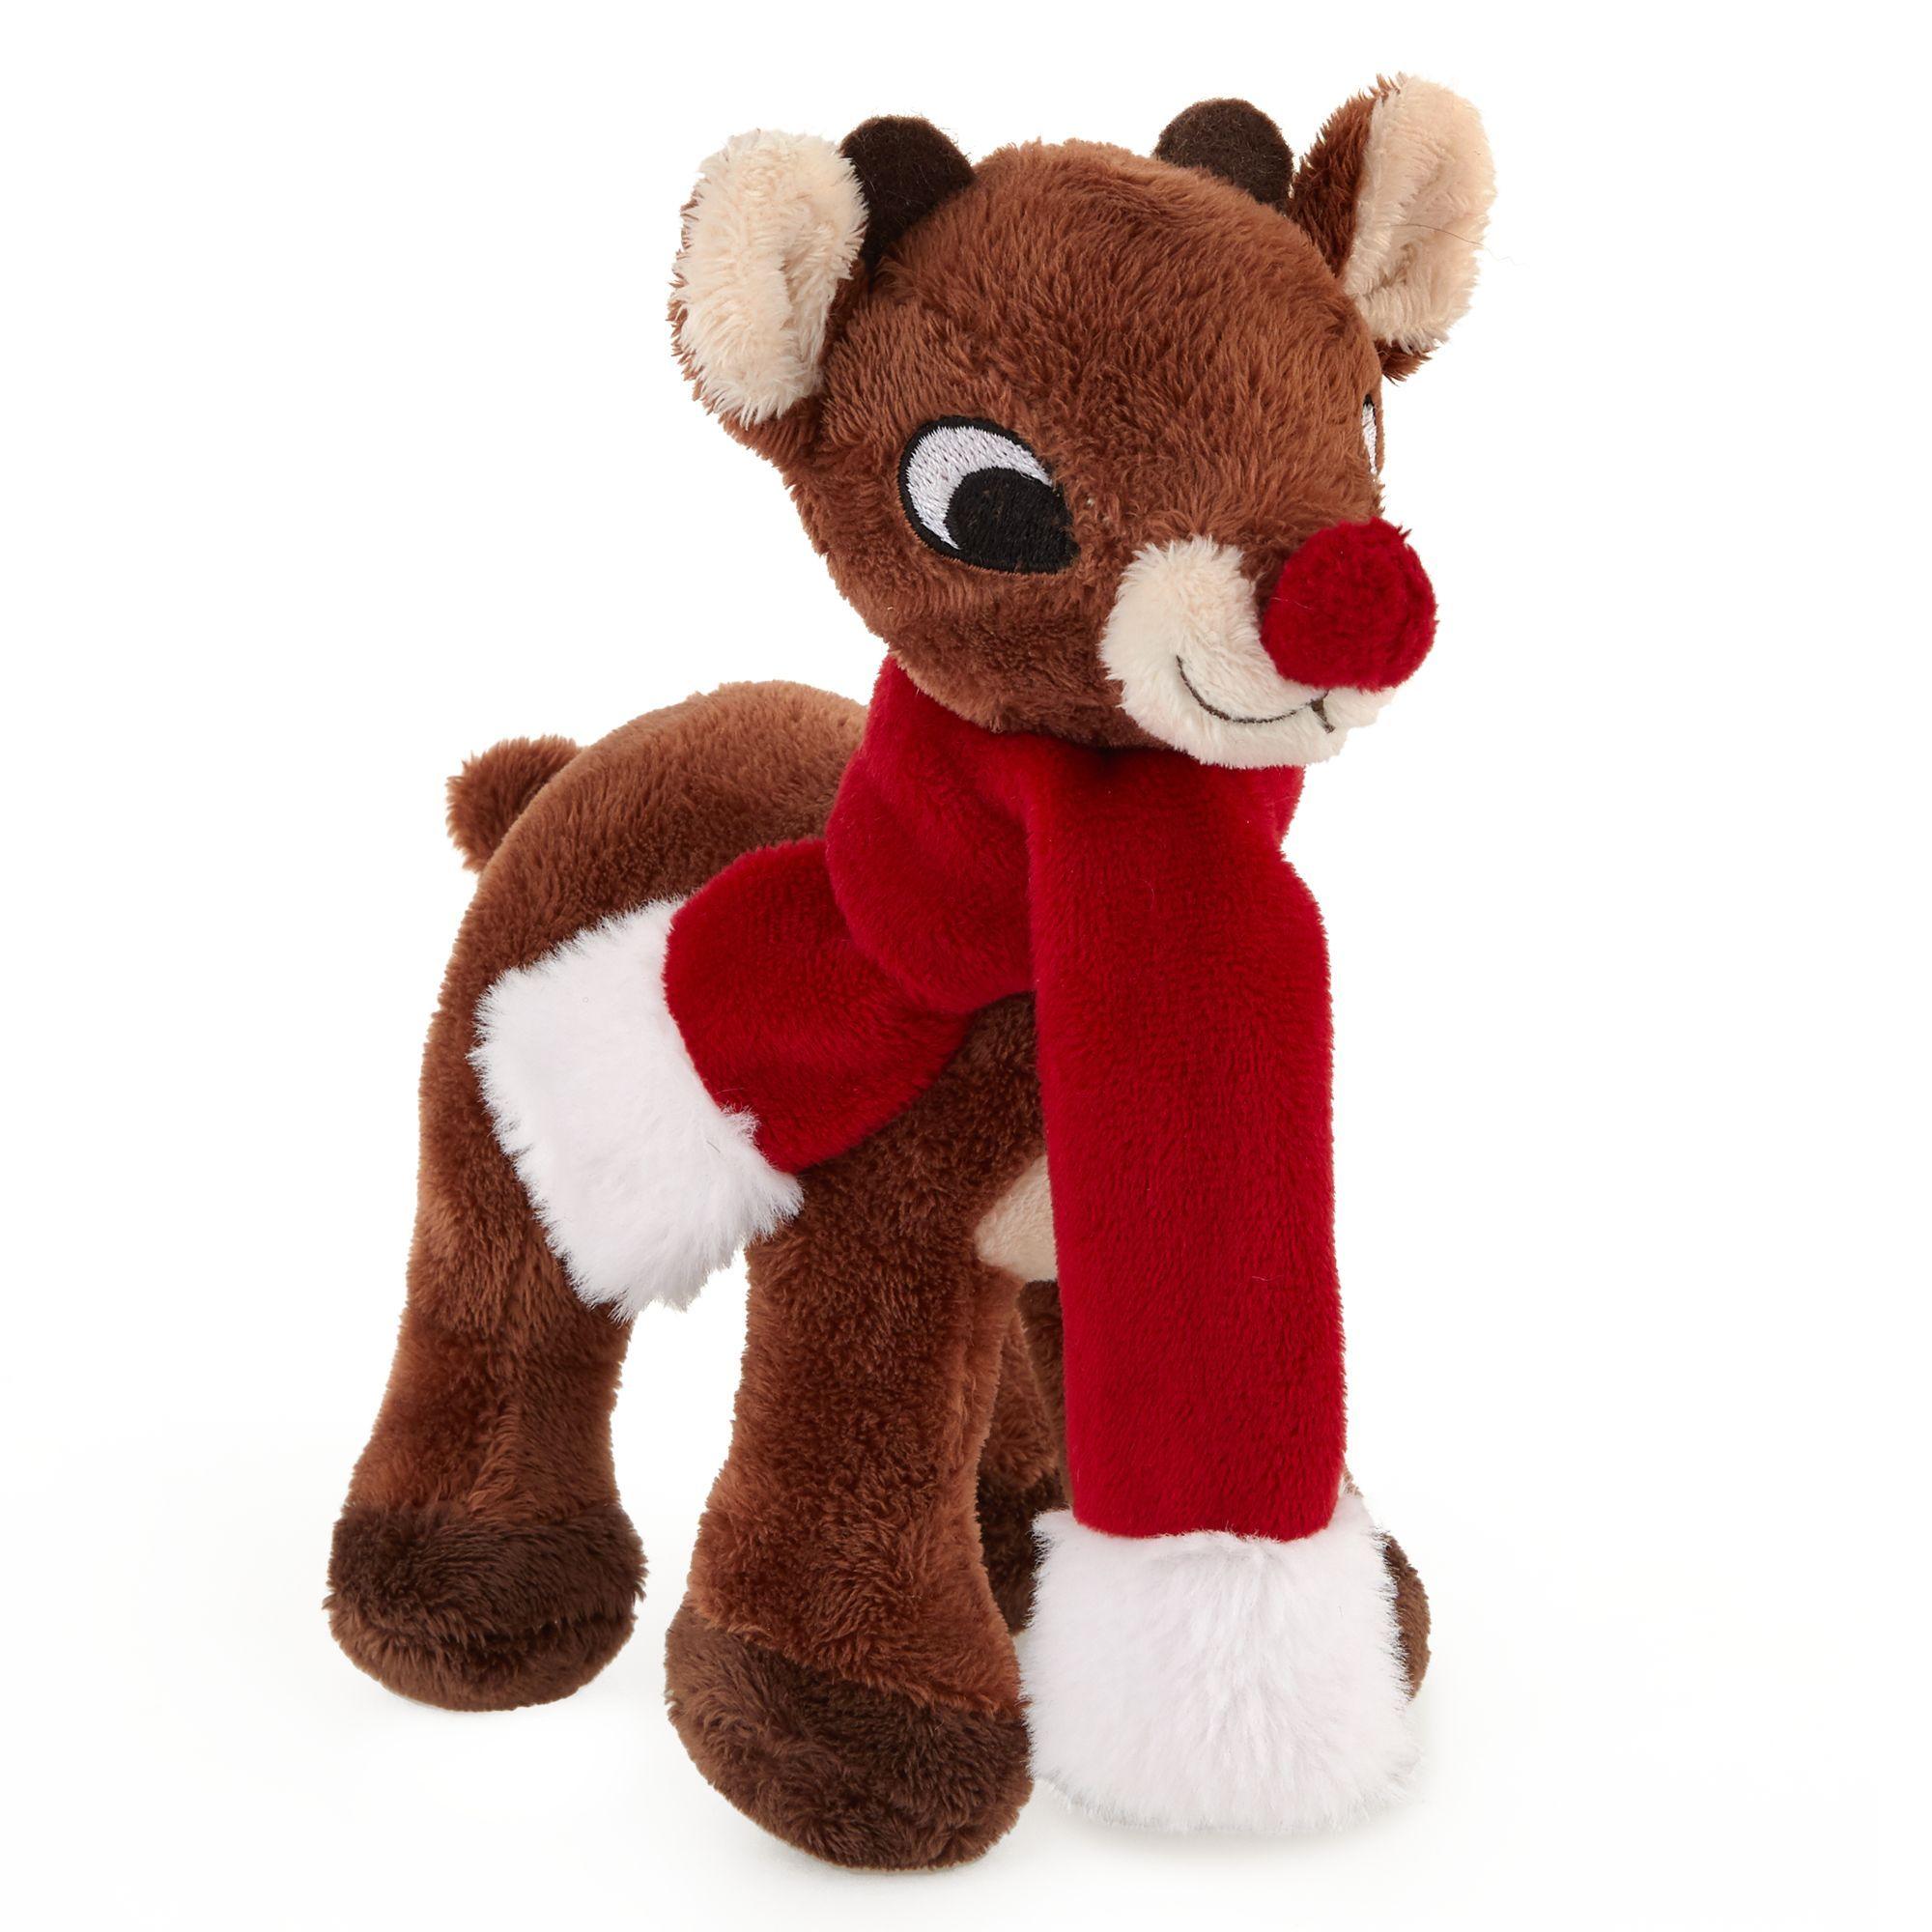 Rudolph Holiday Reindeer Dog Toy Plush Squeaker Petsmart Dog